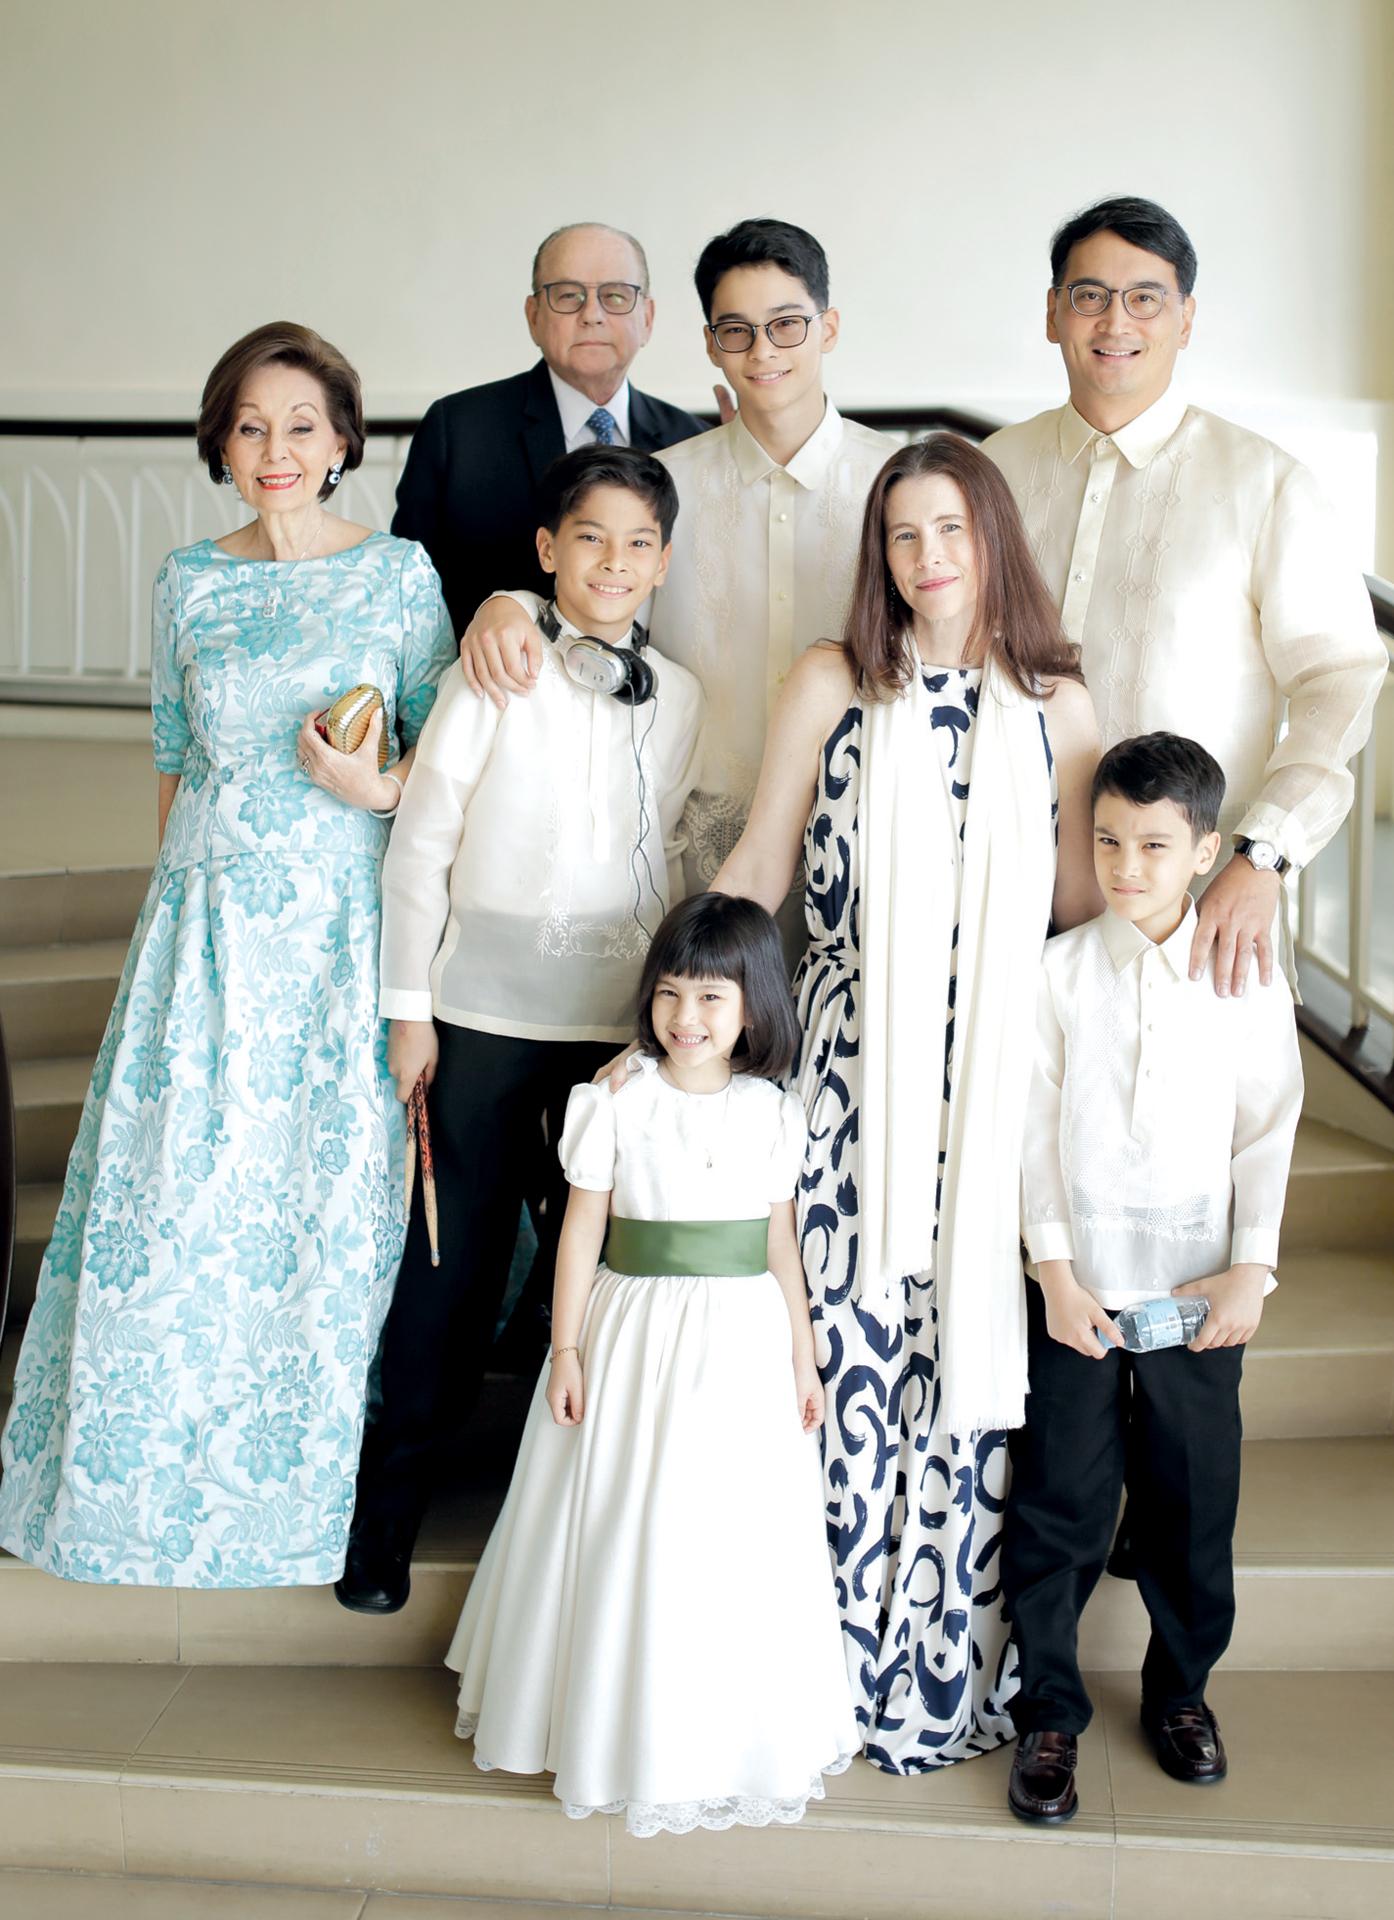 Antonio Ortigas Olbes and family